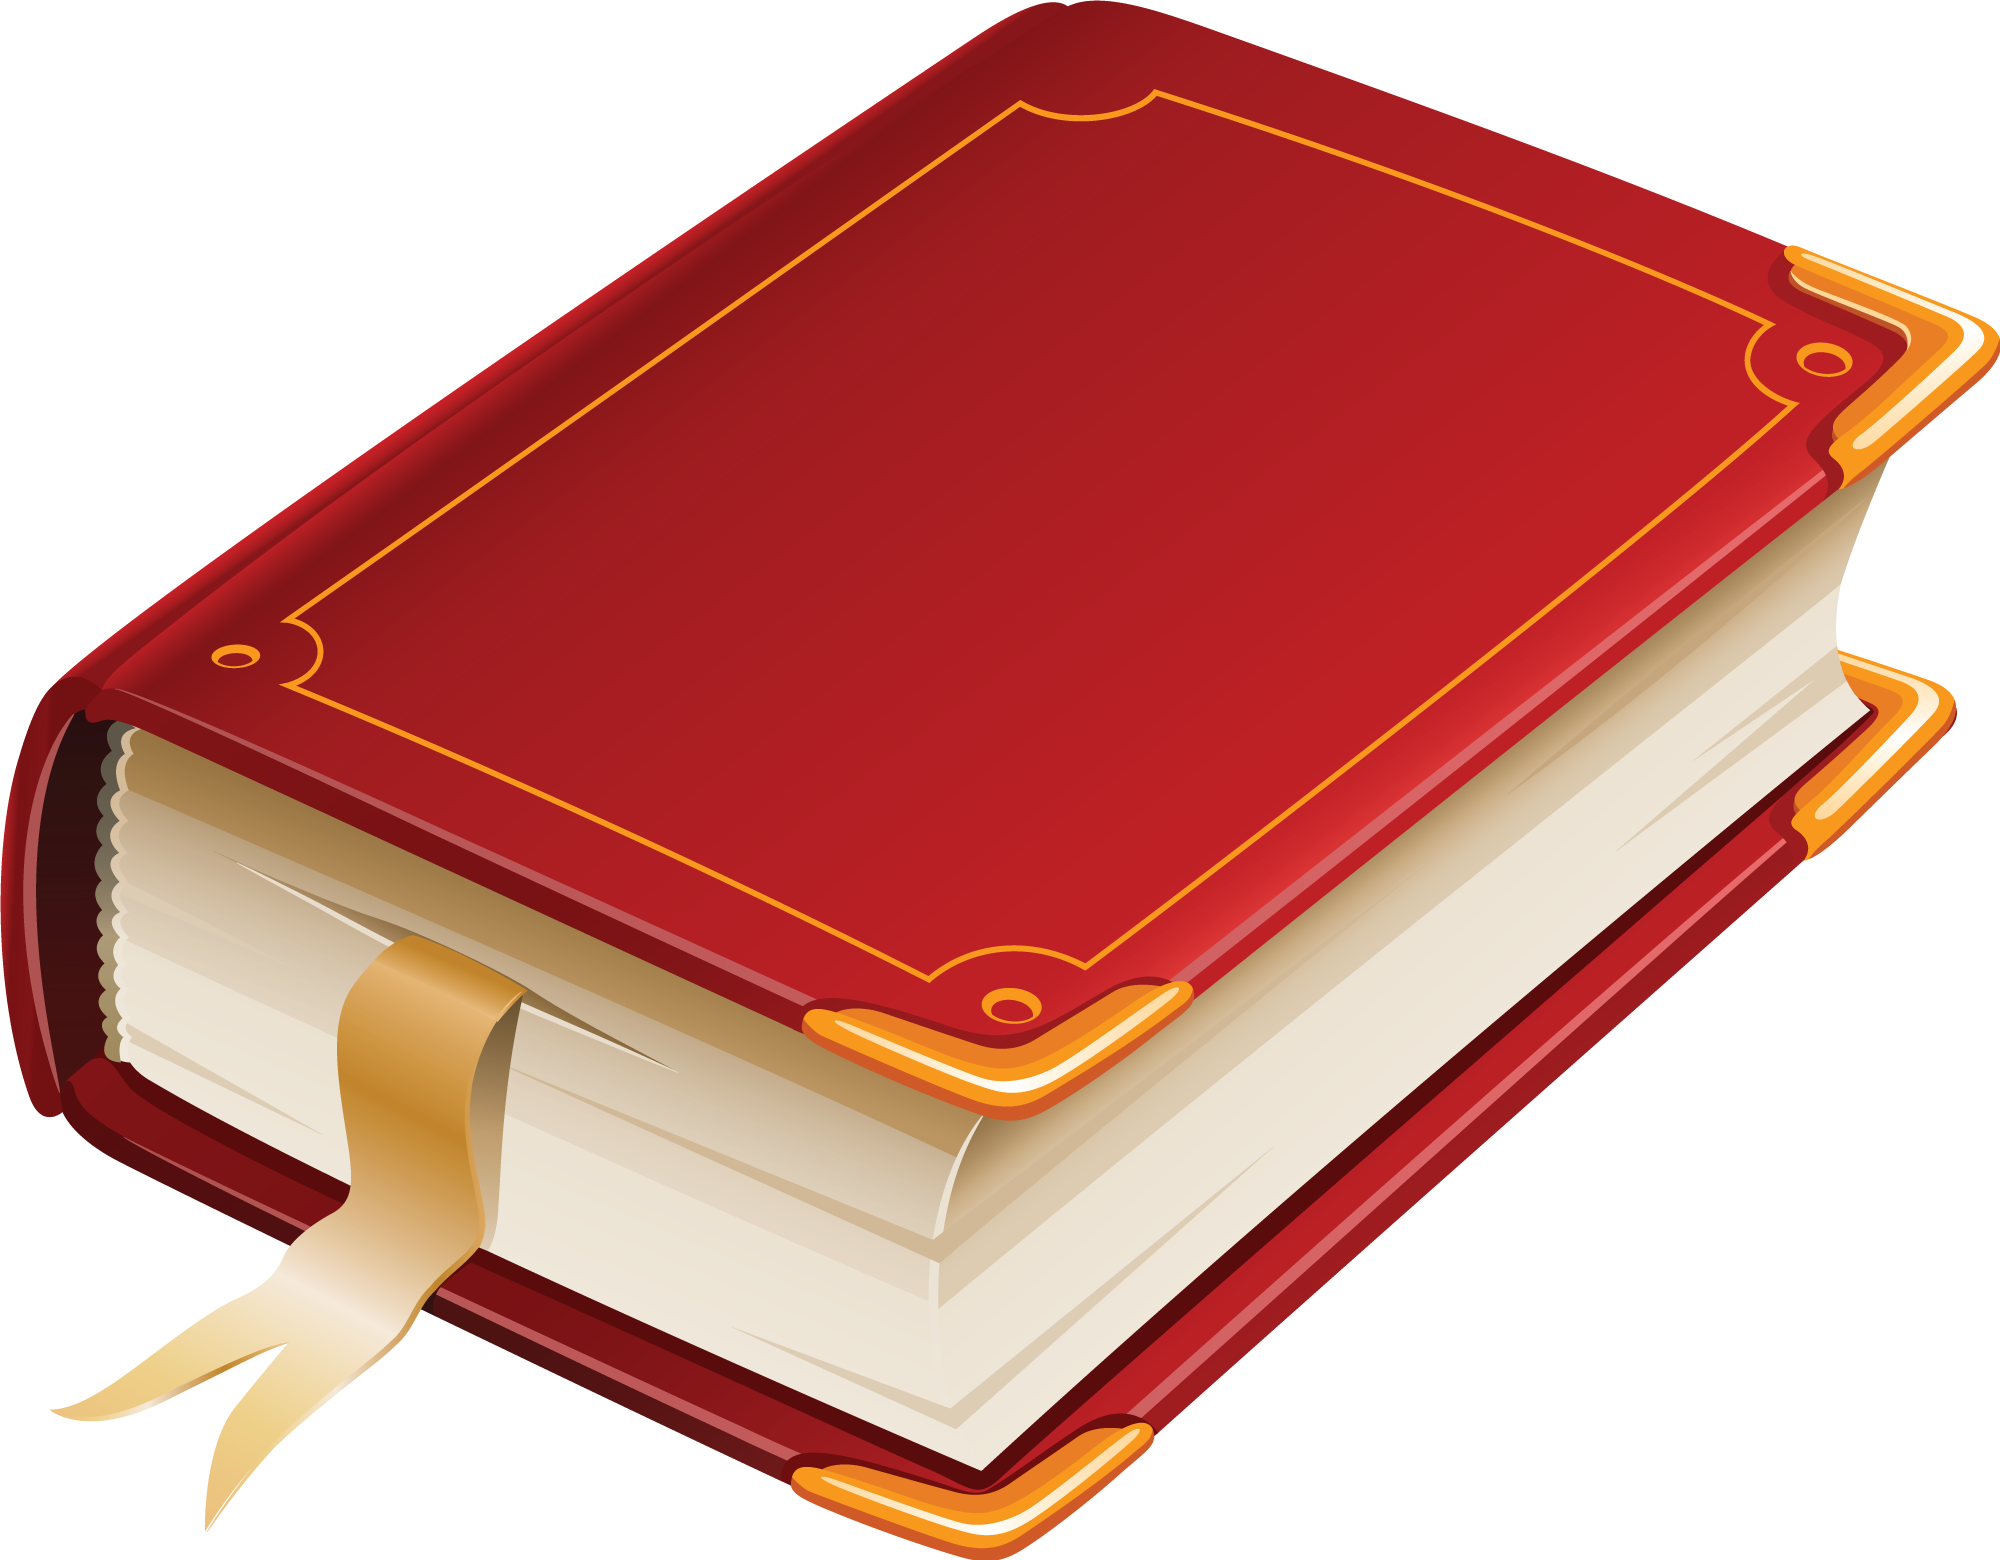 Book PNG Image